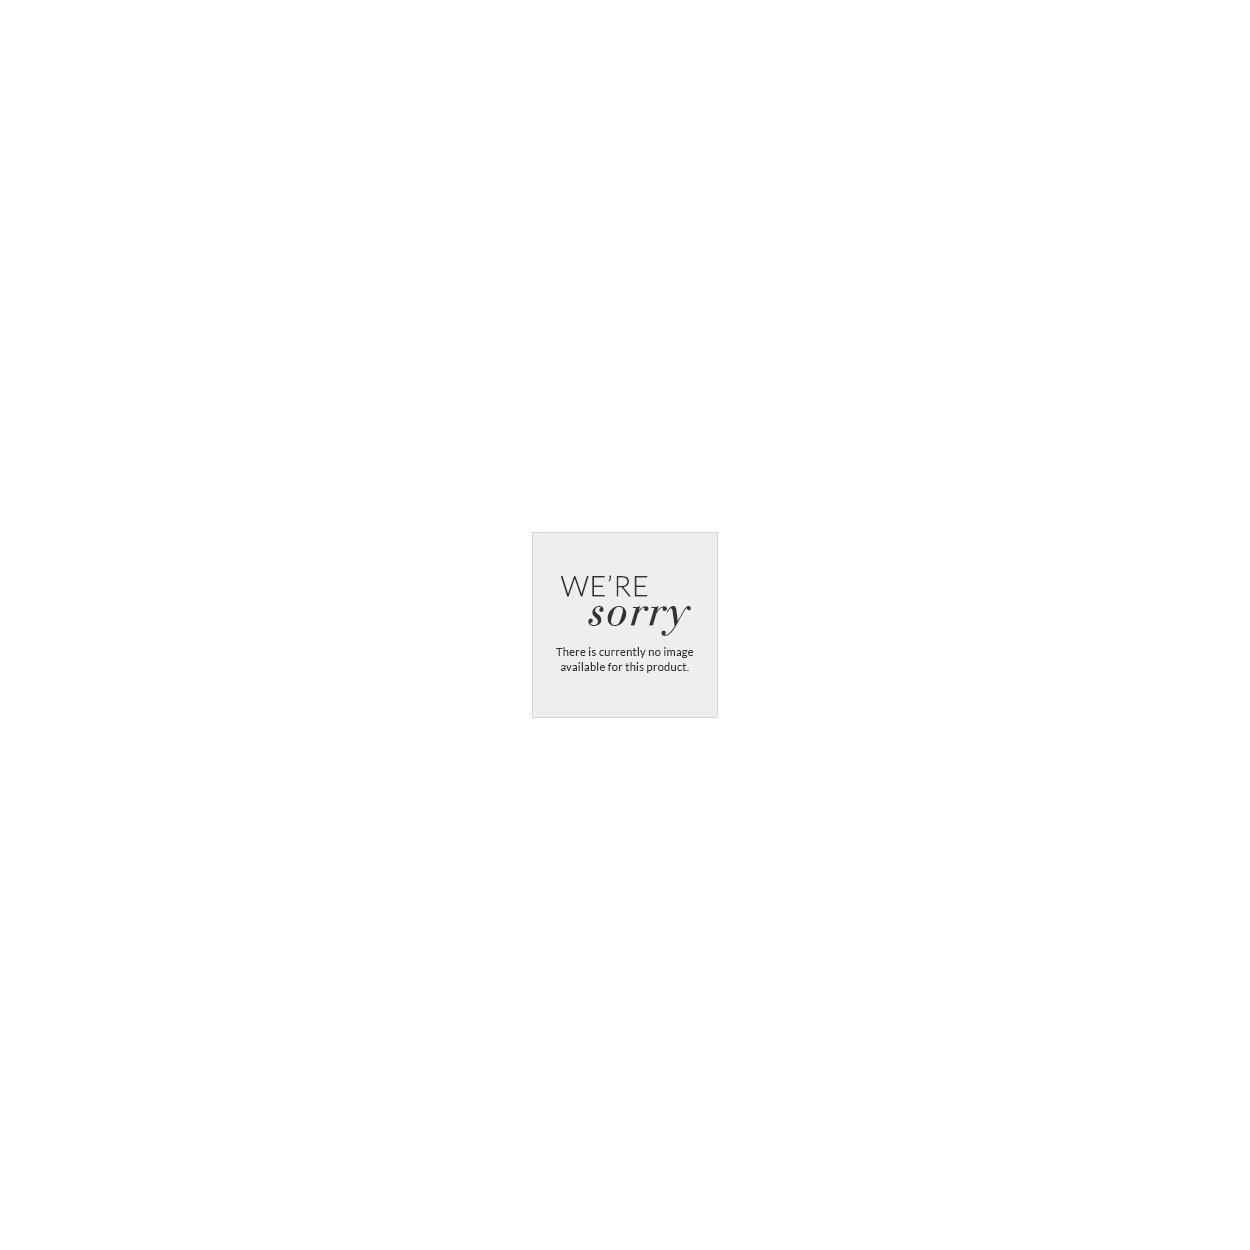 Nice Debenhams Geisha M Parasol  Debenhams With Outstanding About This Item With Comely Garden Logos Also Gardeners Hamper In Addition Garden Entertainment Area Ideas And Garden Plants And Shrubs As Well As King Of Diamonds Hatton Garden Additionally Dobbies Garden Centre Opening Times From Debenhamscom With   Outstanding Debenhams Geisha M Parasol  Debenhams With Comely About This Item And Nice Garden Logos Also Gardeners Hamper In Addition Garden Entertainment Area Ideas From Debenhamscom